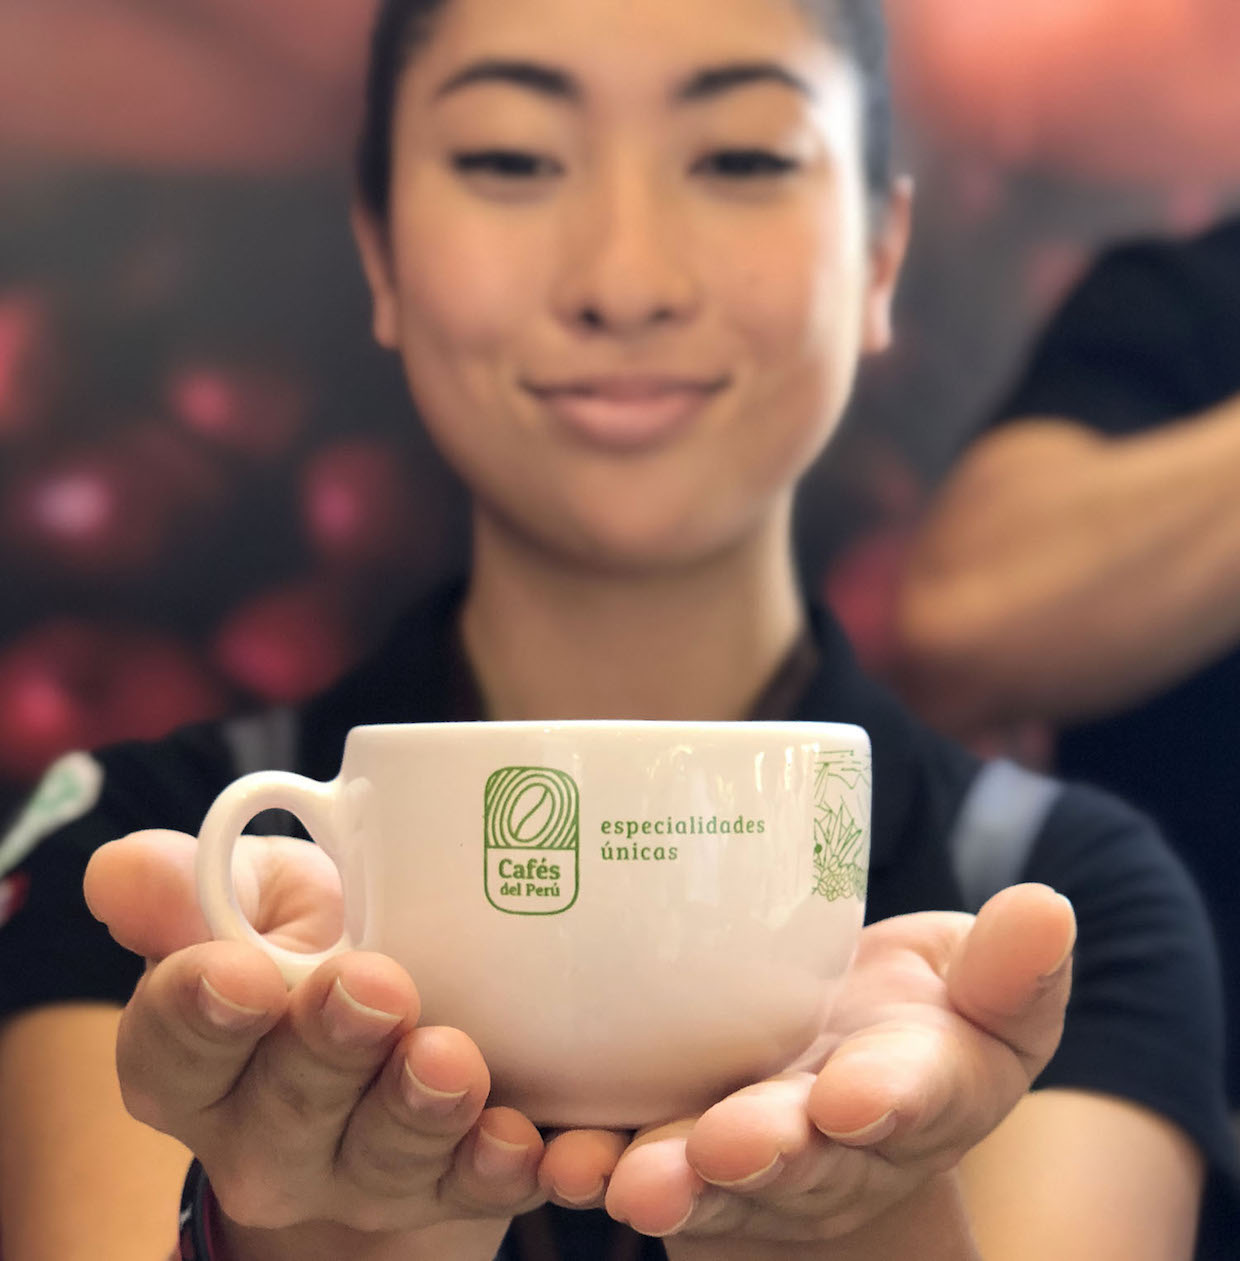 Cafes del Peru brand